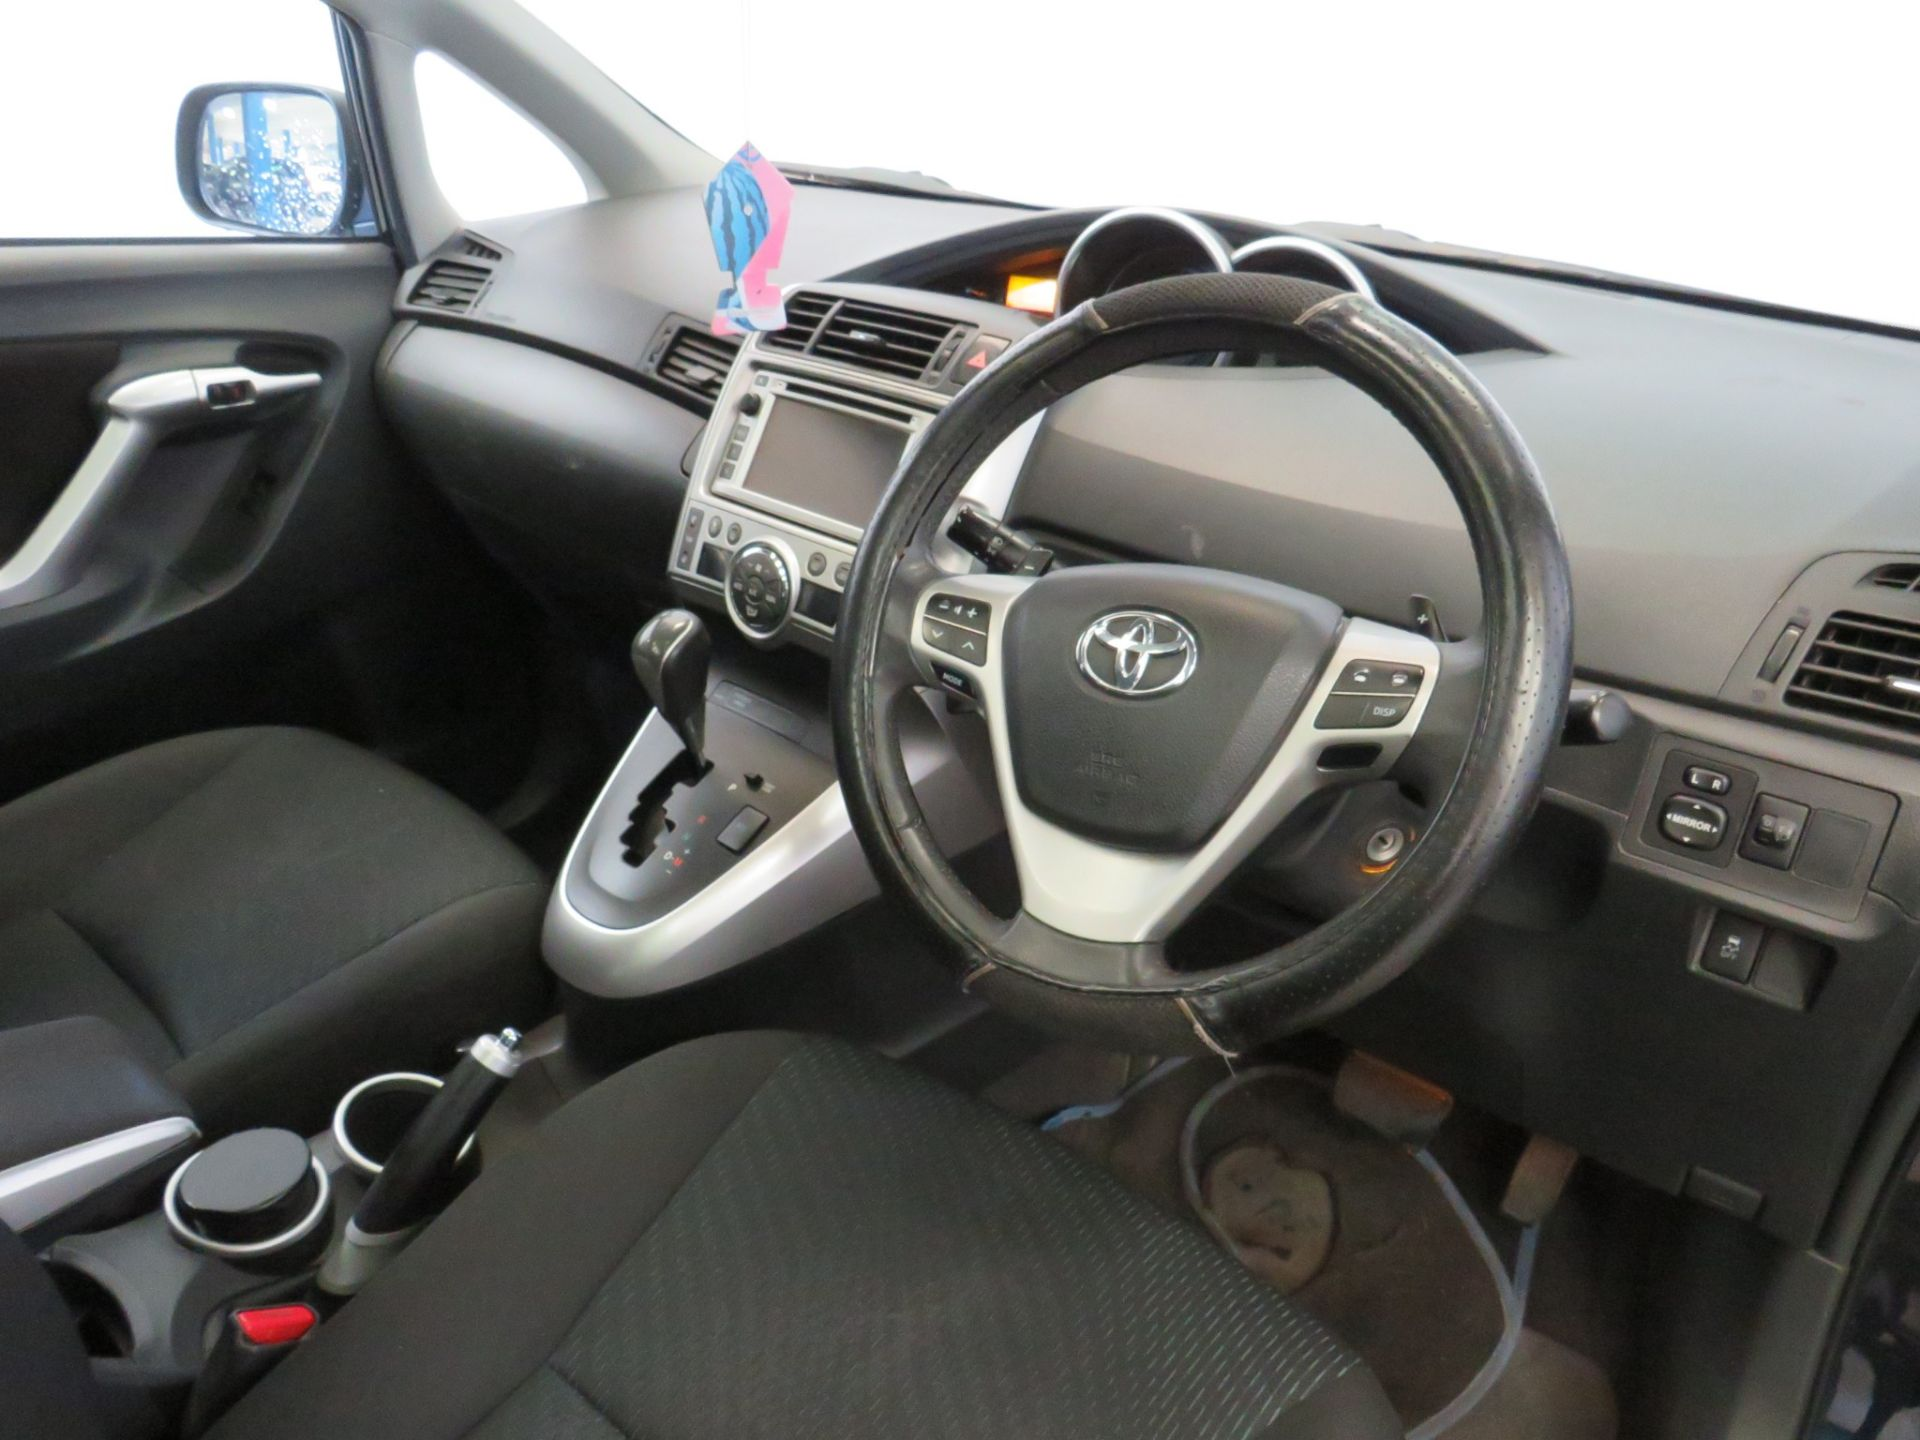 Lot 15 - 2012 Toyota Verso TR Valvematic CVT - 1798cc